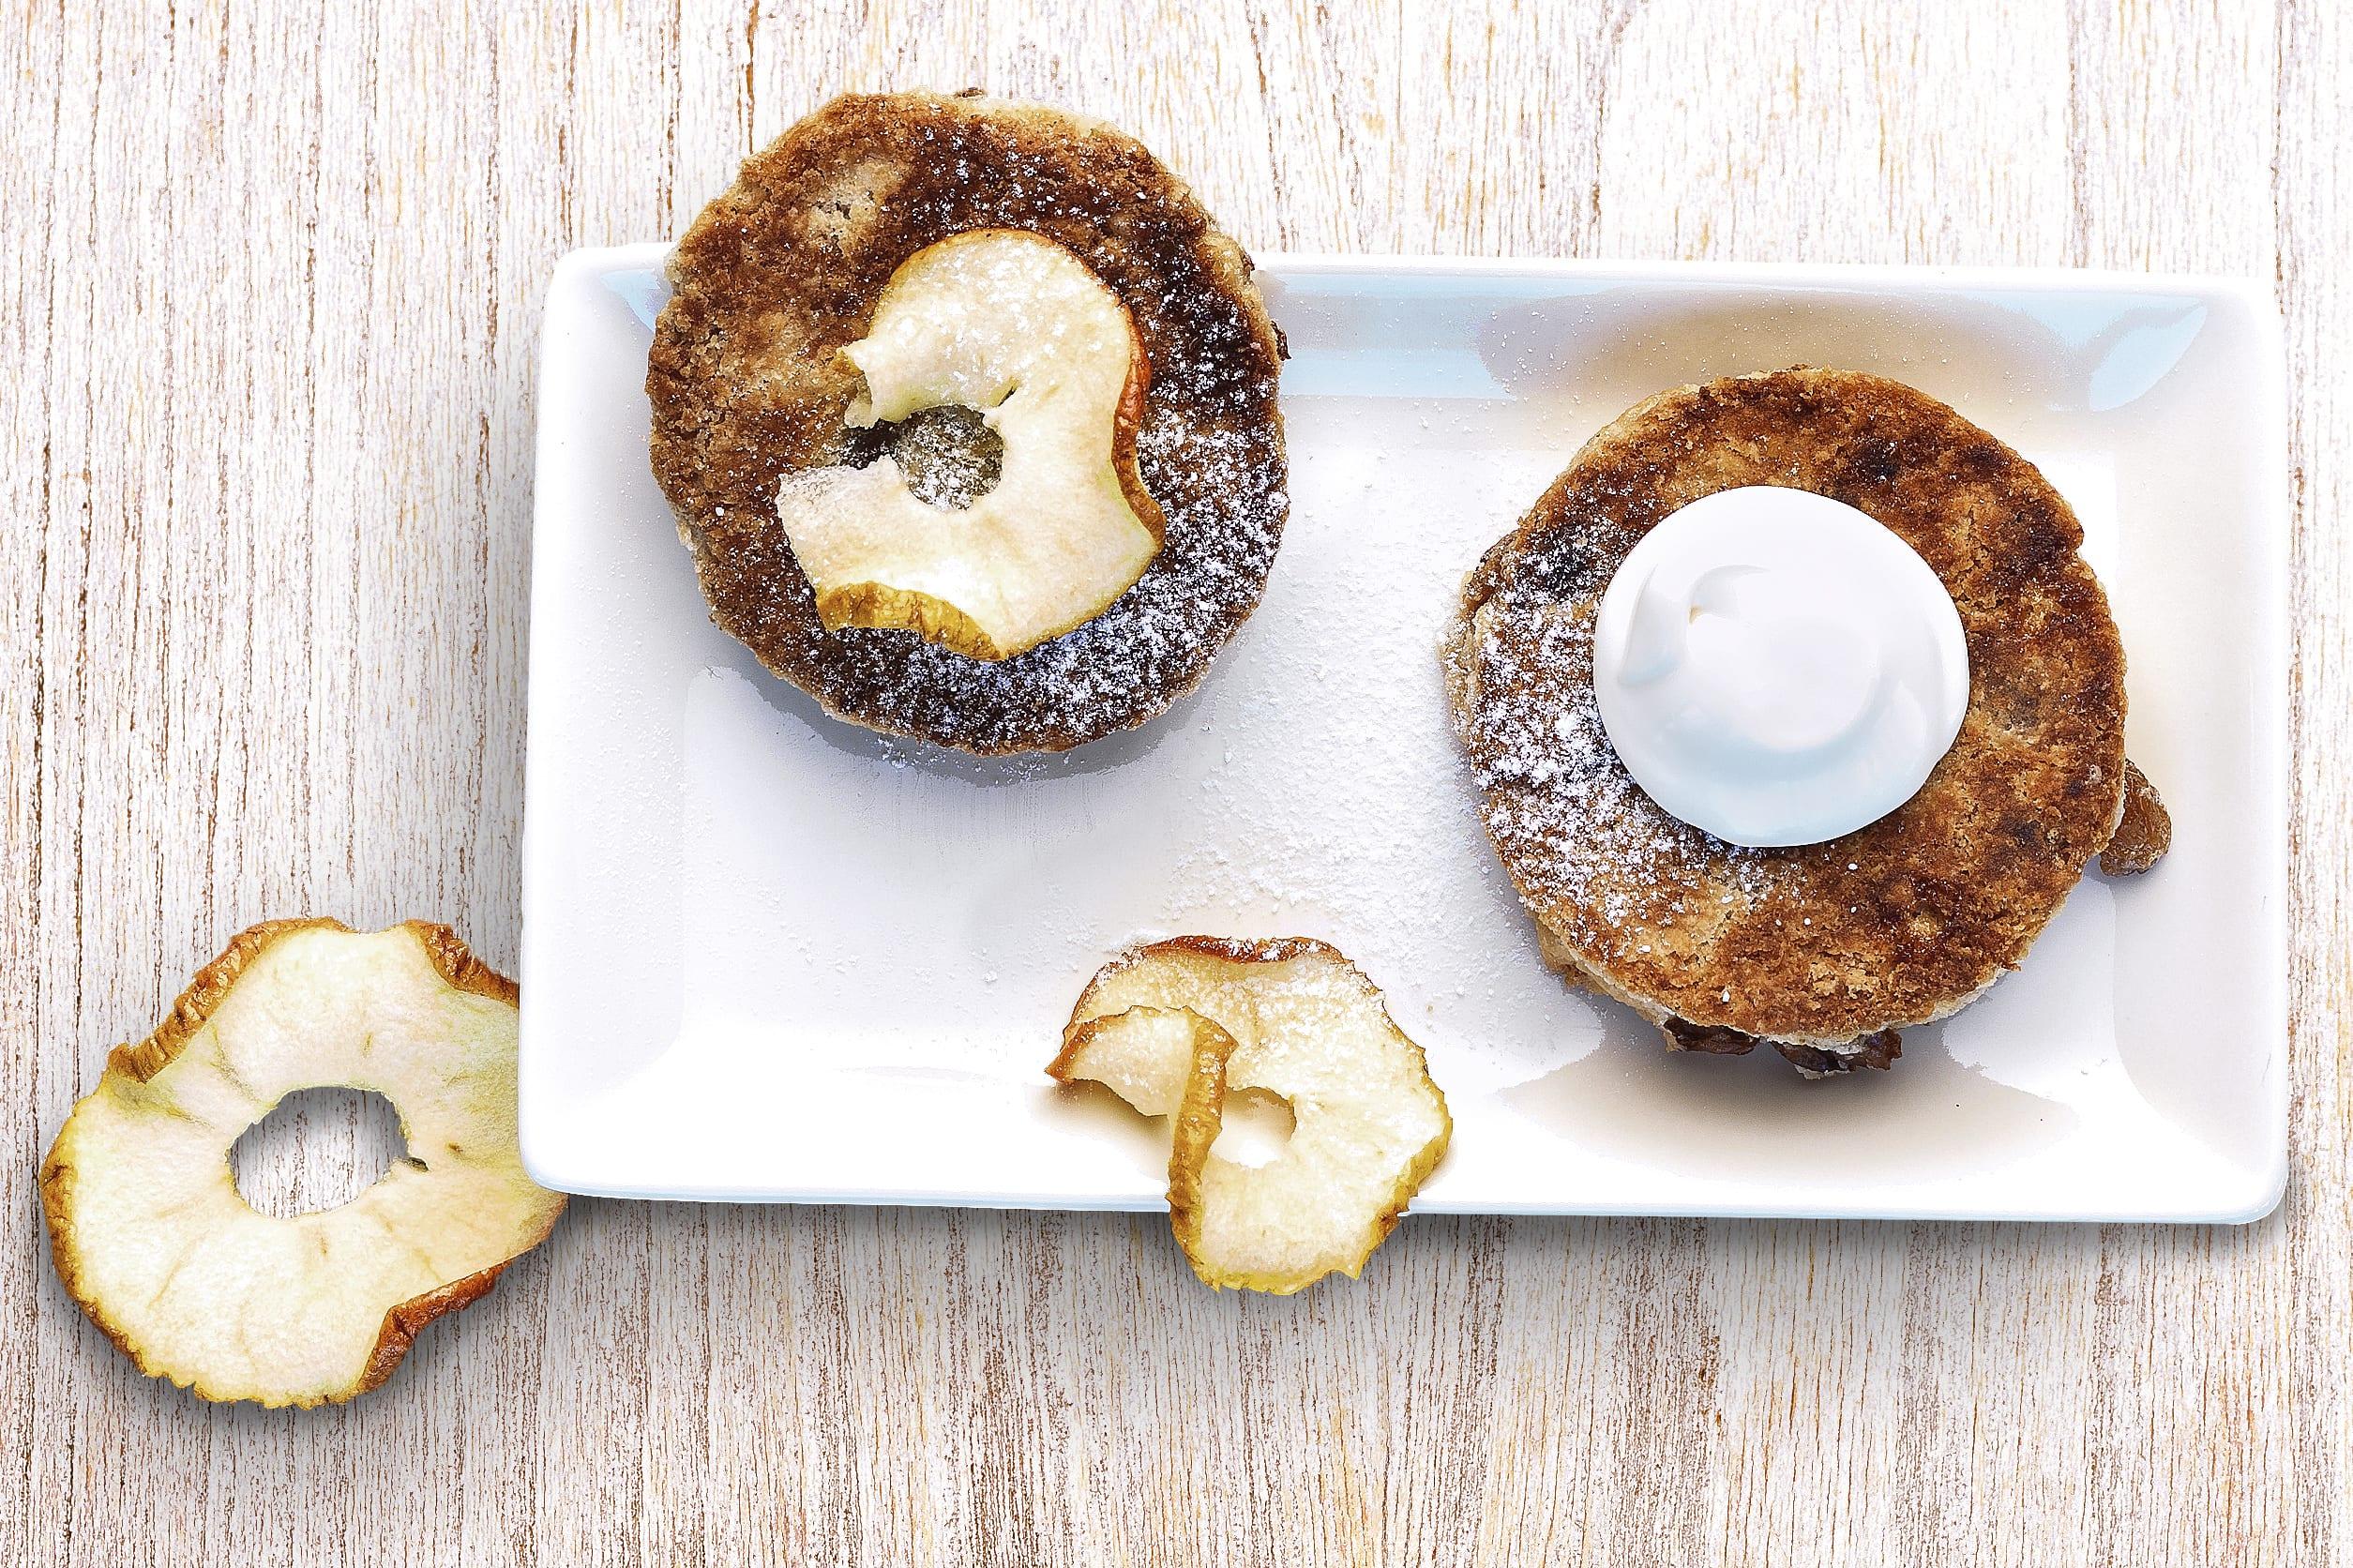 Welsh cakes et chips de pommes